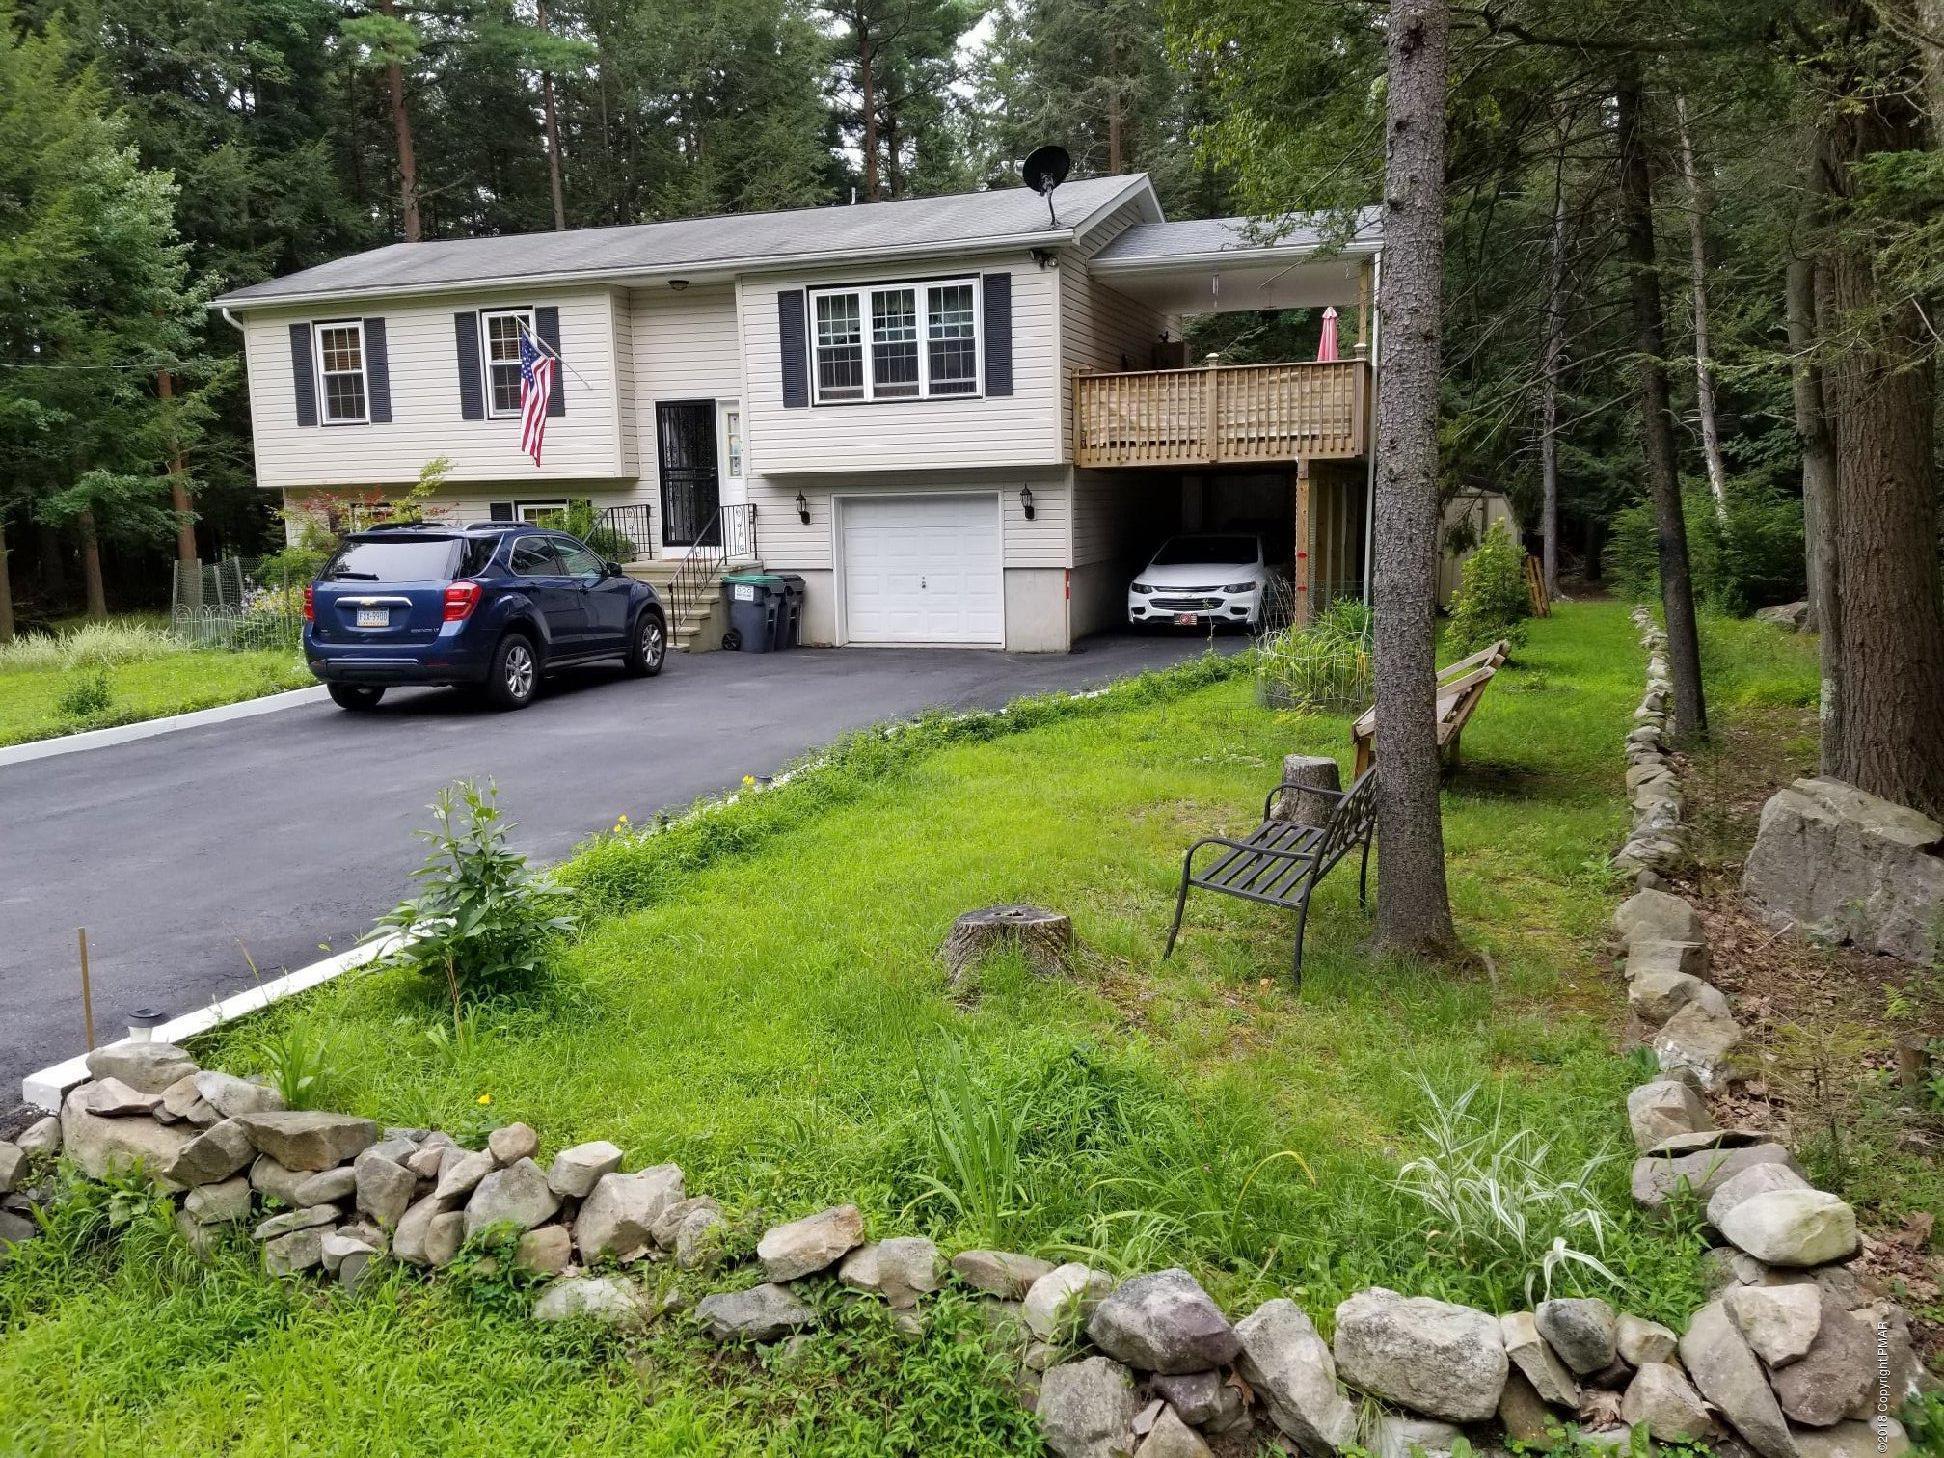 331 Scotch Pine Drive, Pocono Summit, PA 18346